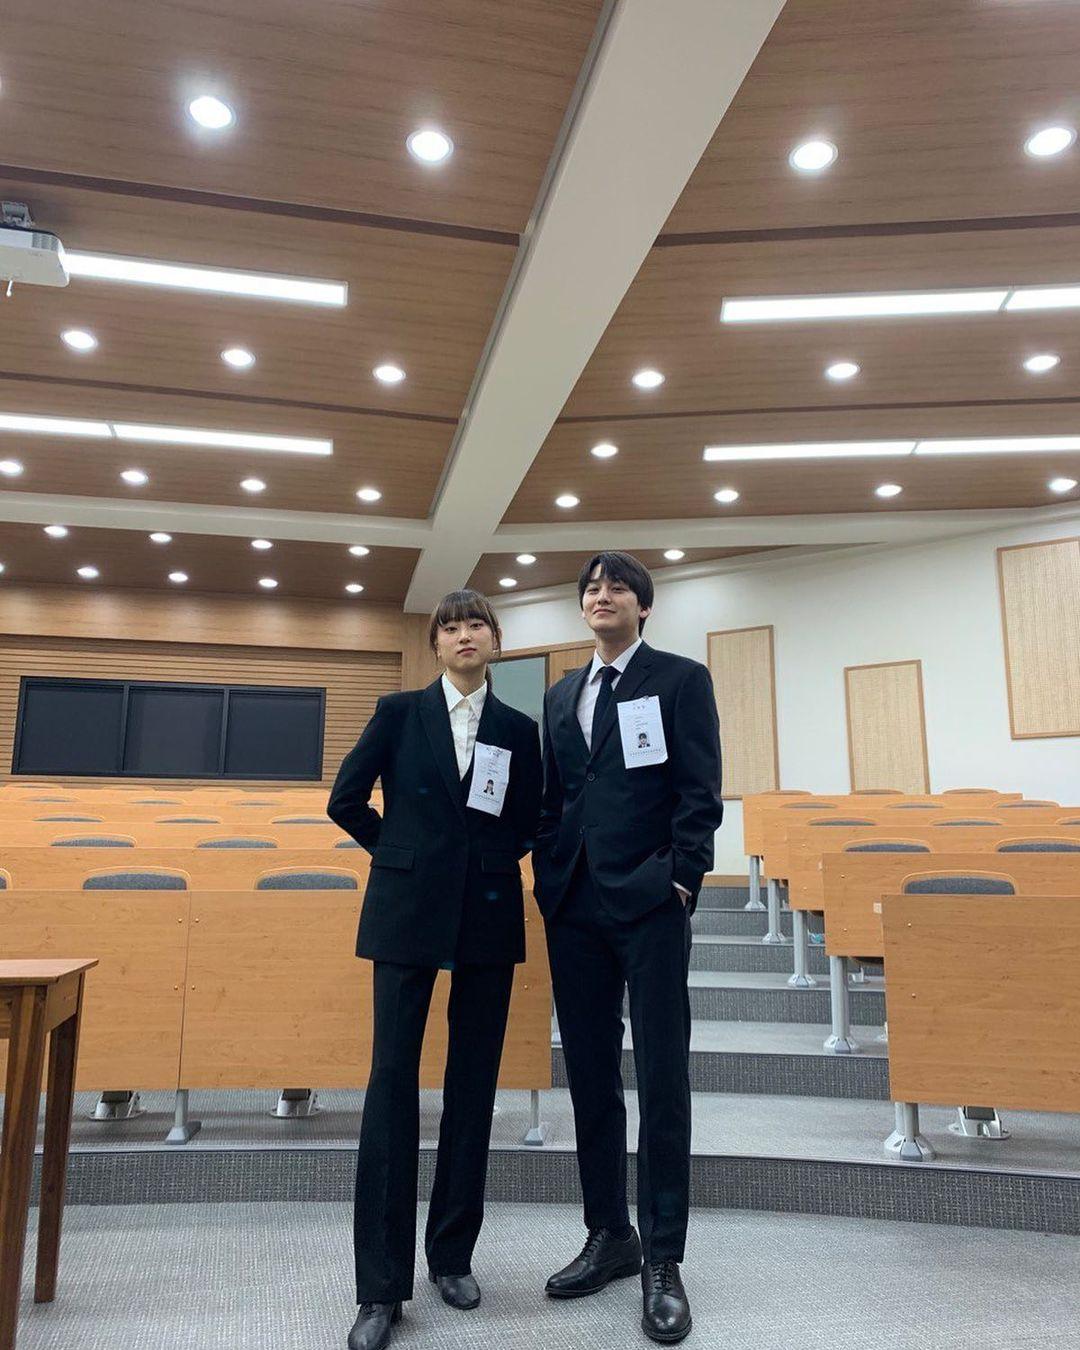 K-drama: Law School